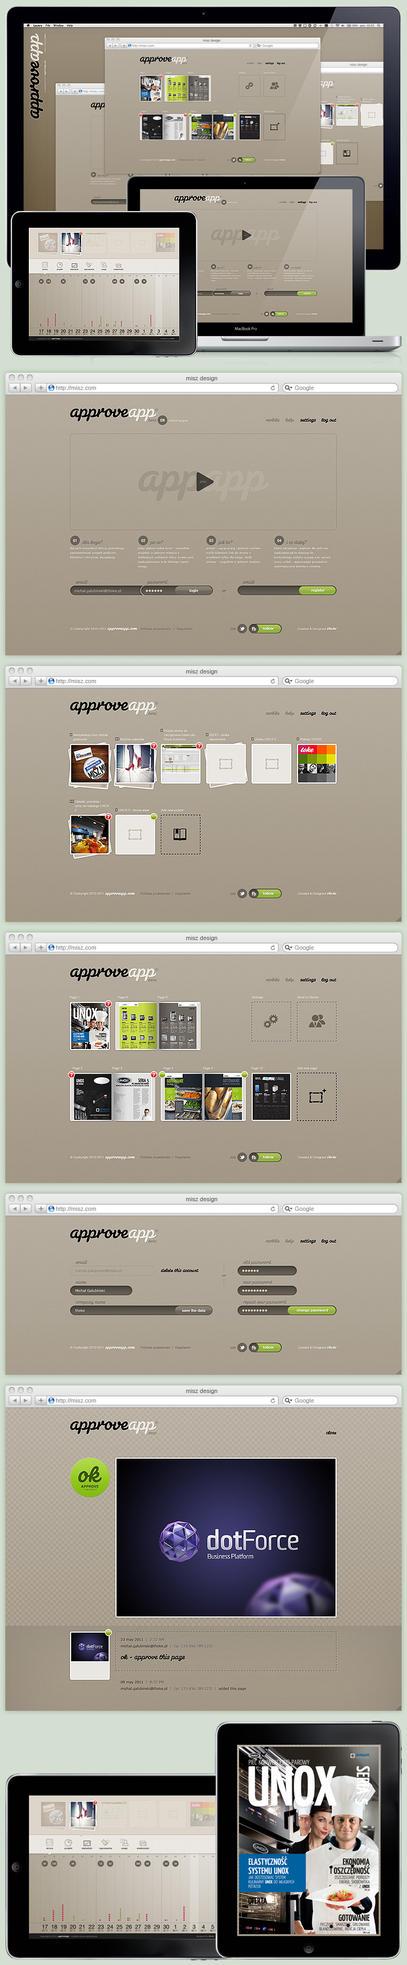 approveapp.com by misz000